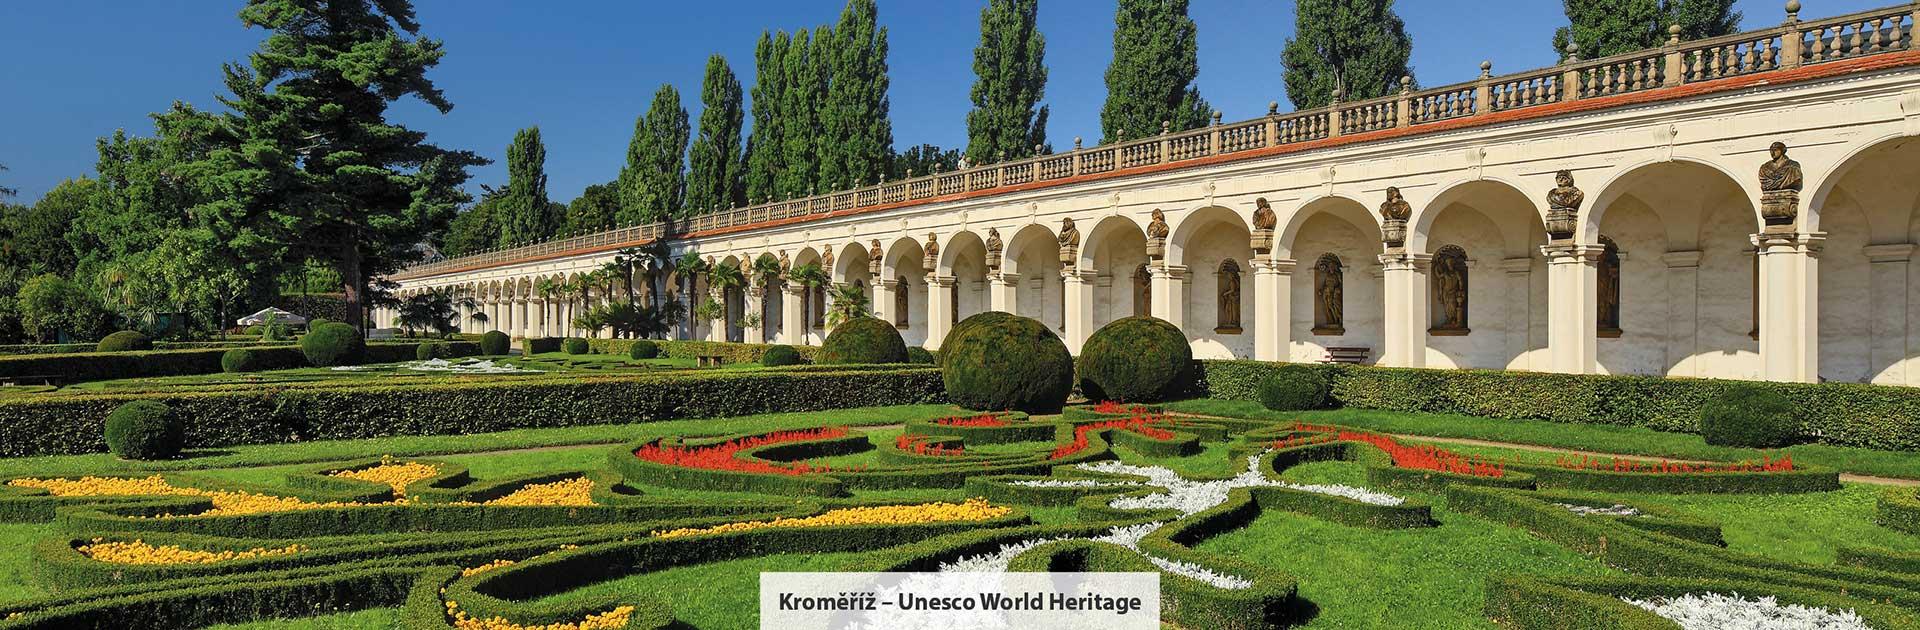 Kroměříž - Unesco World Heritage